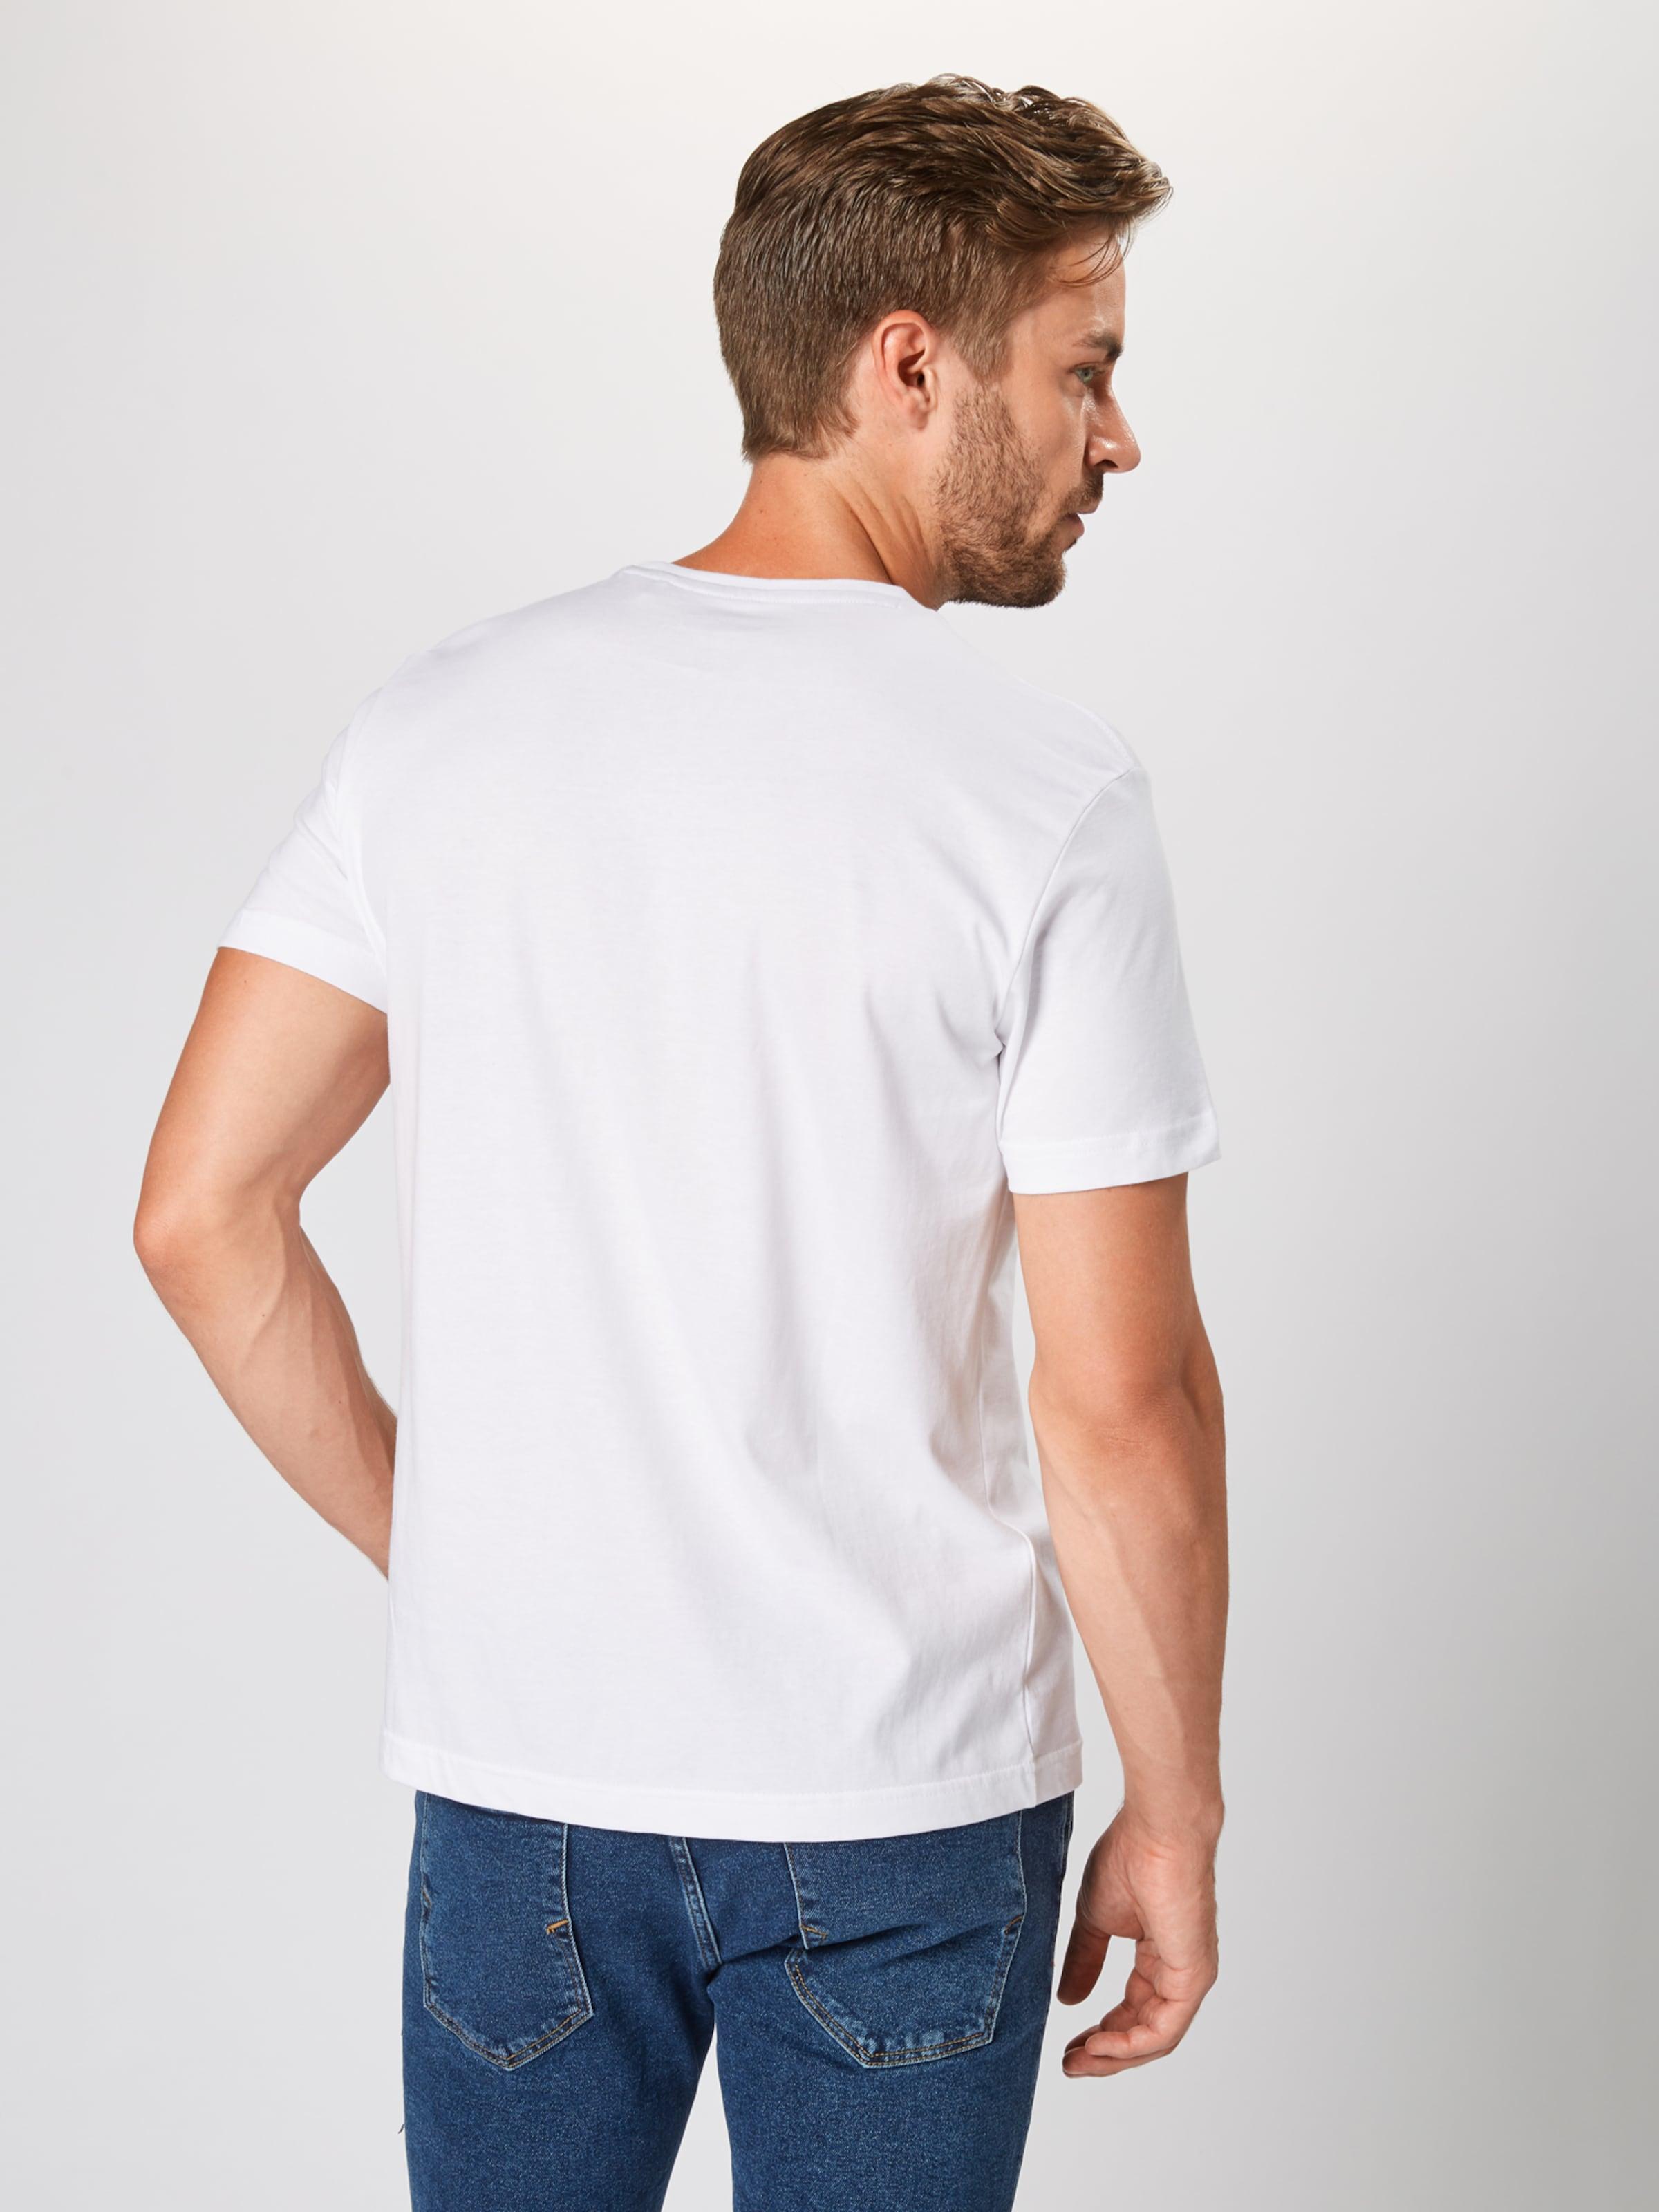 oliver Blanc shirt T Red S Label En sQdhCrtxoB